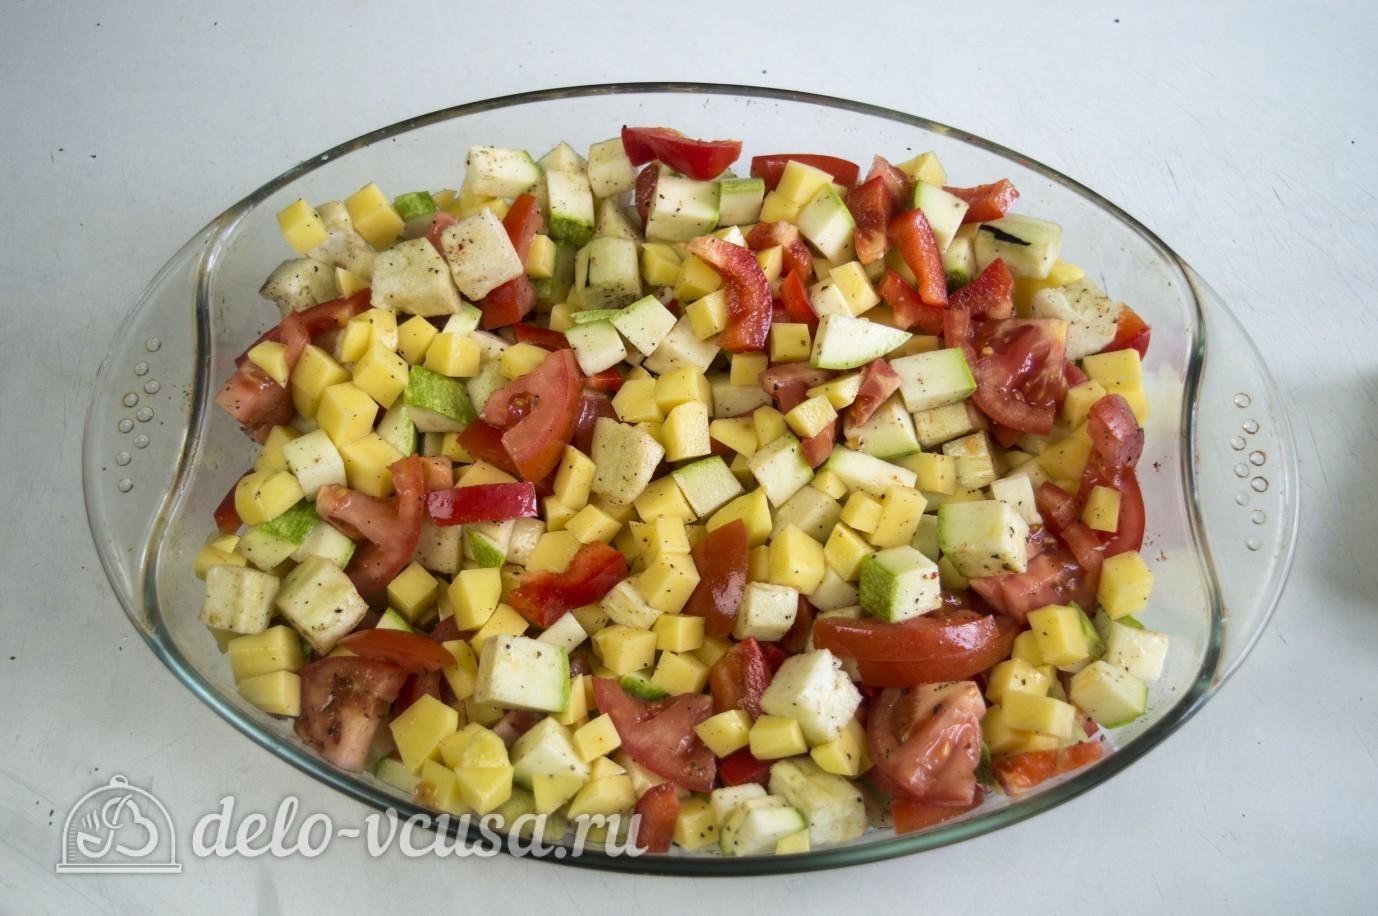 Фарш с овощами в духовке рецепты с фото